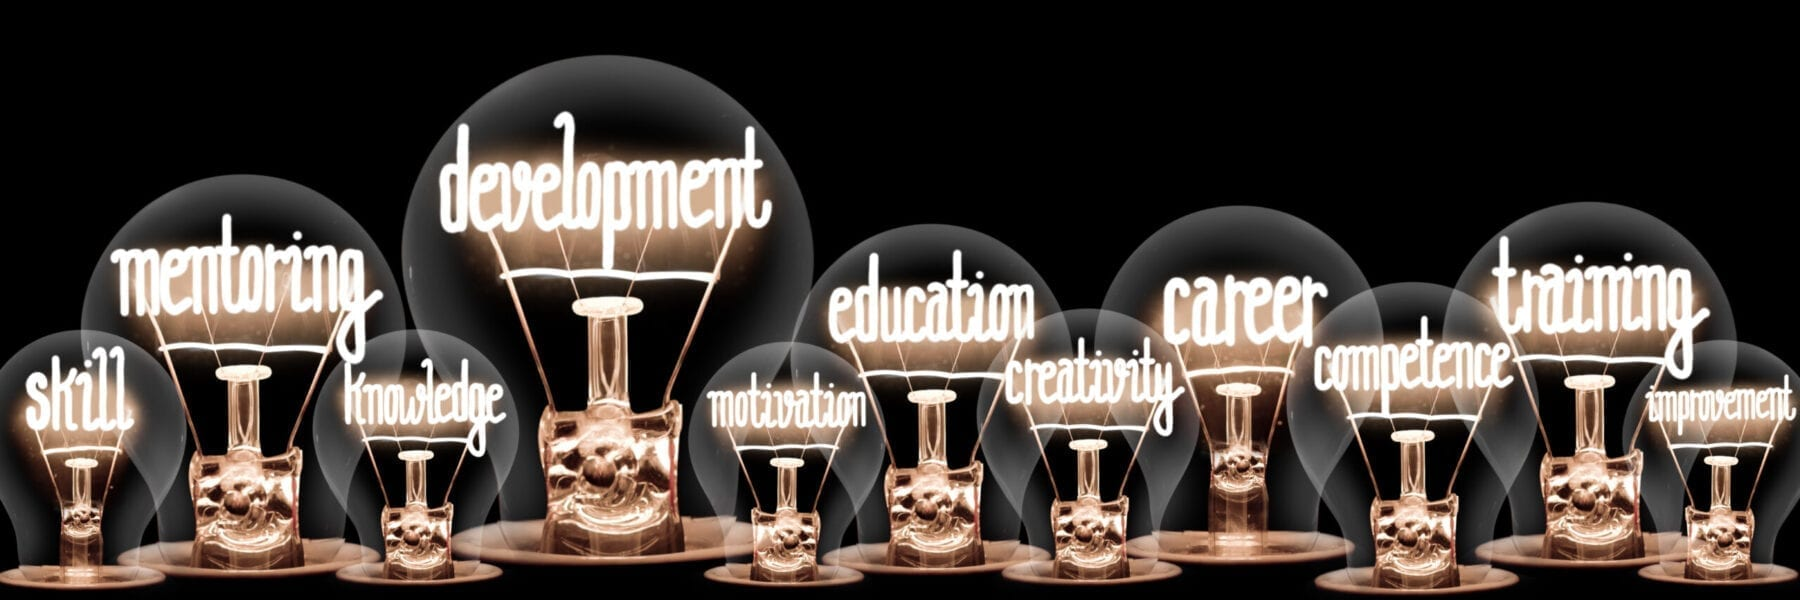 Light Bulbs with Development Concept